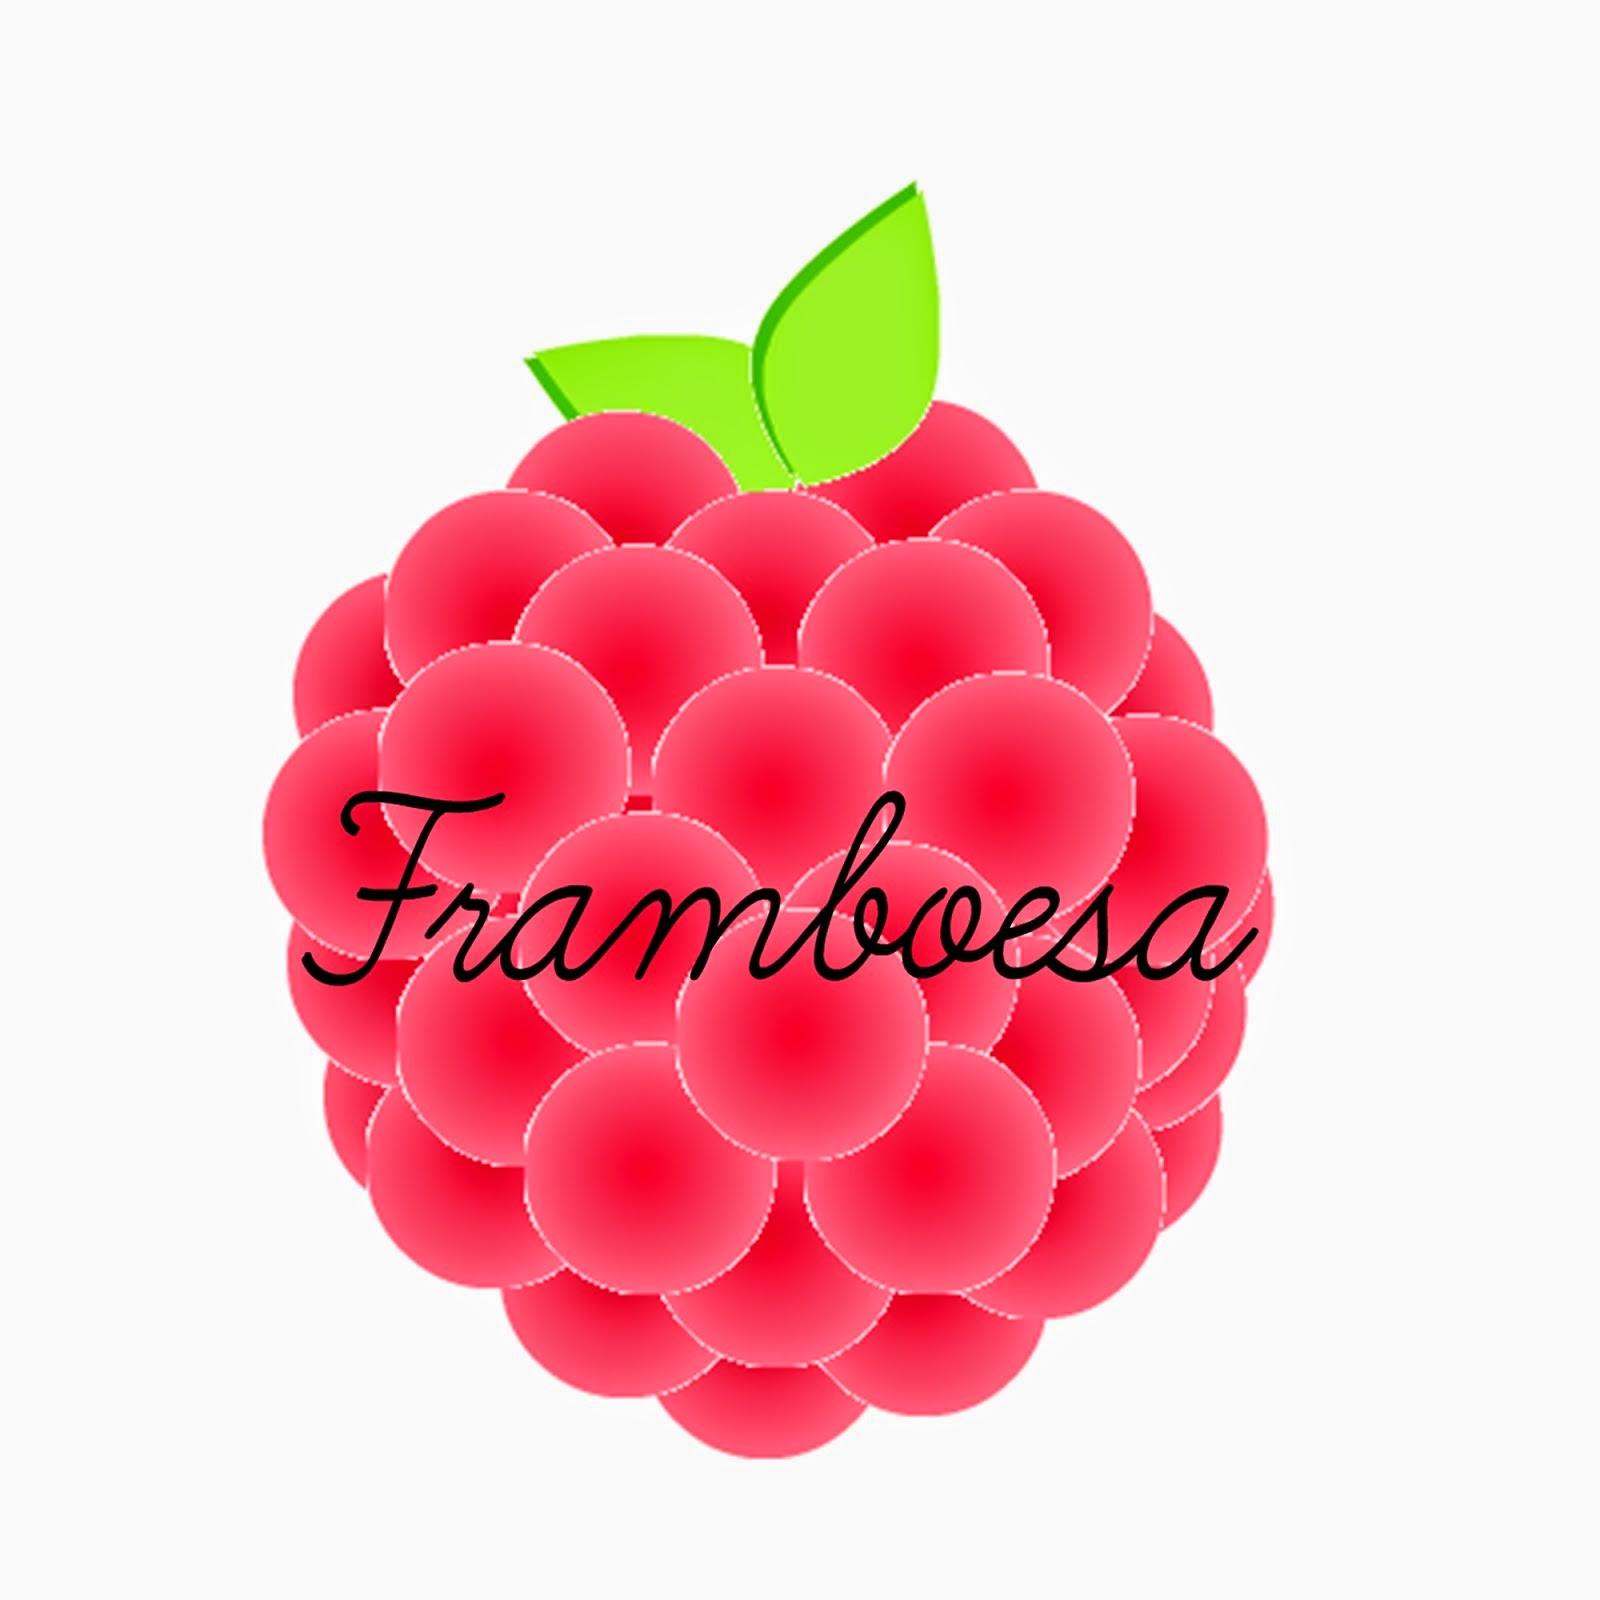 Framboesa